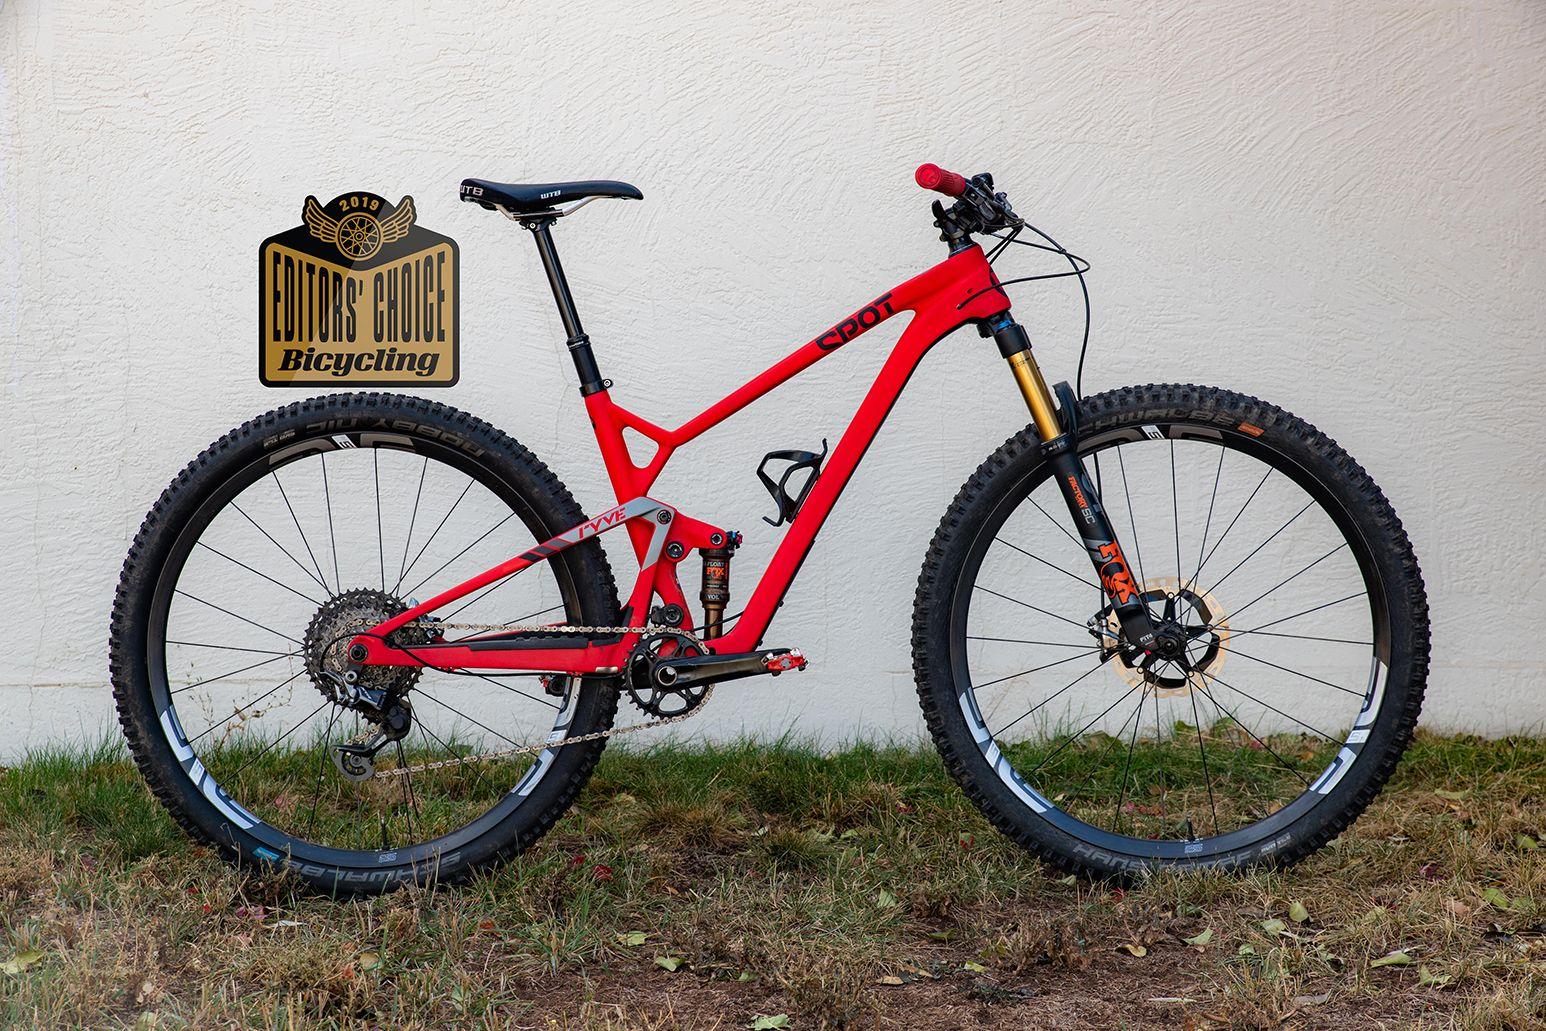 Cycling Singletrack MTB Mountain Bike Issue 115 Cycle Magazine